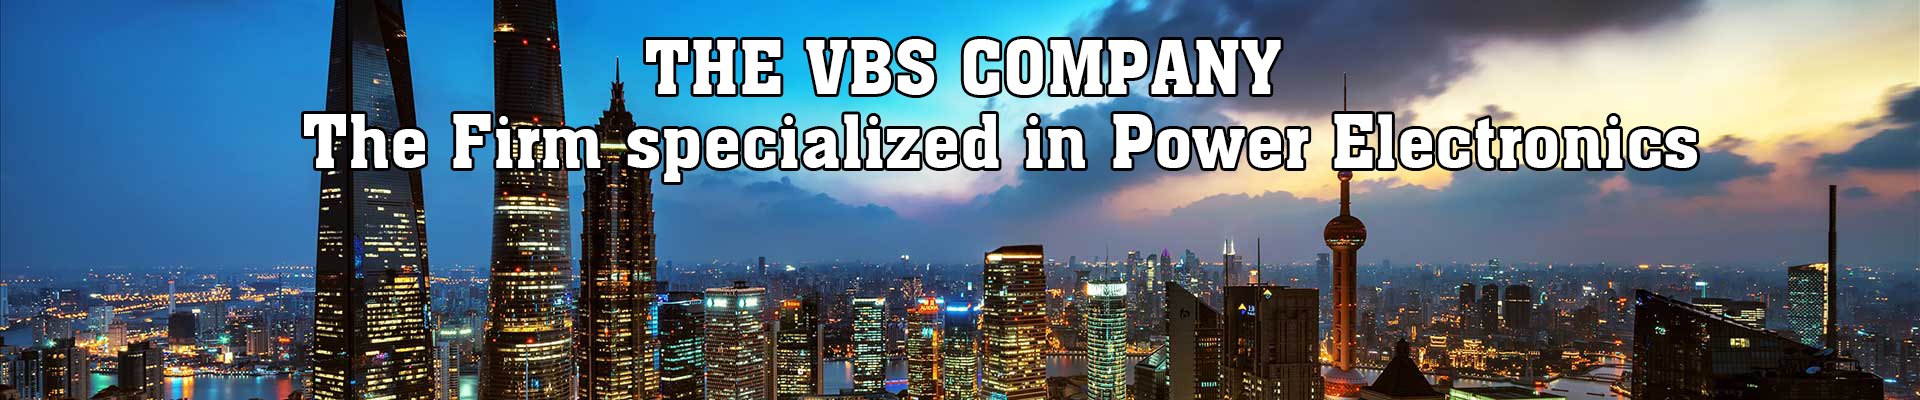 The vbs company